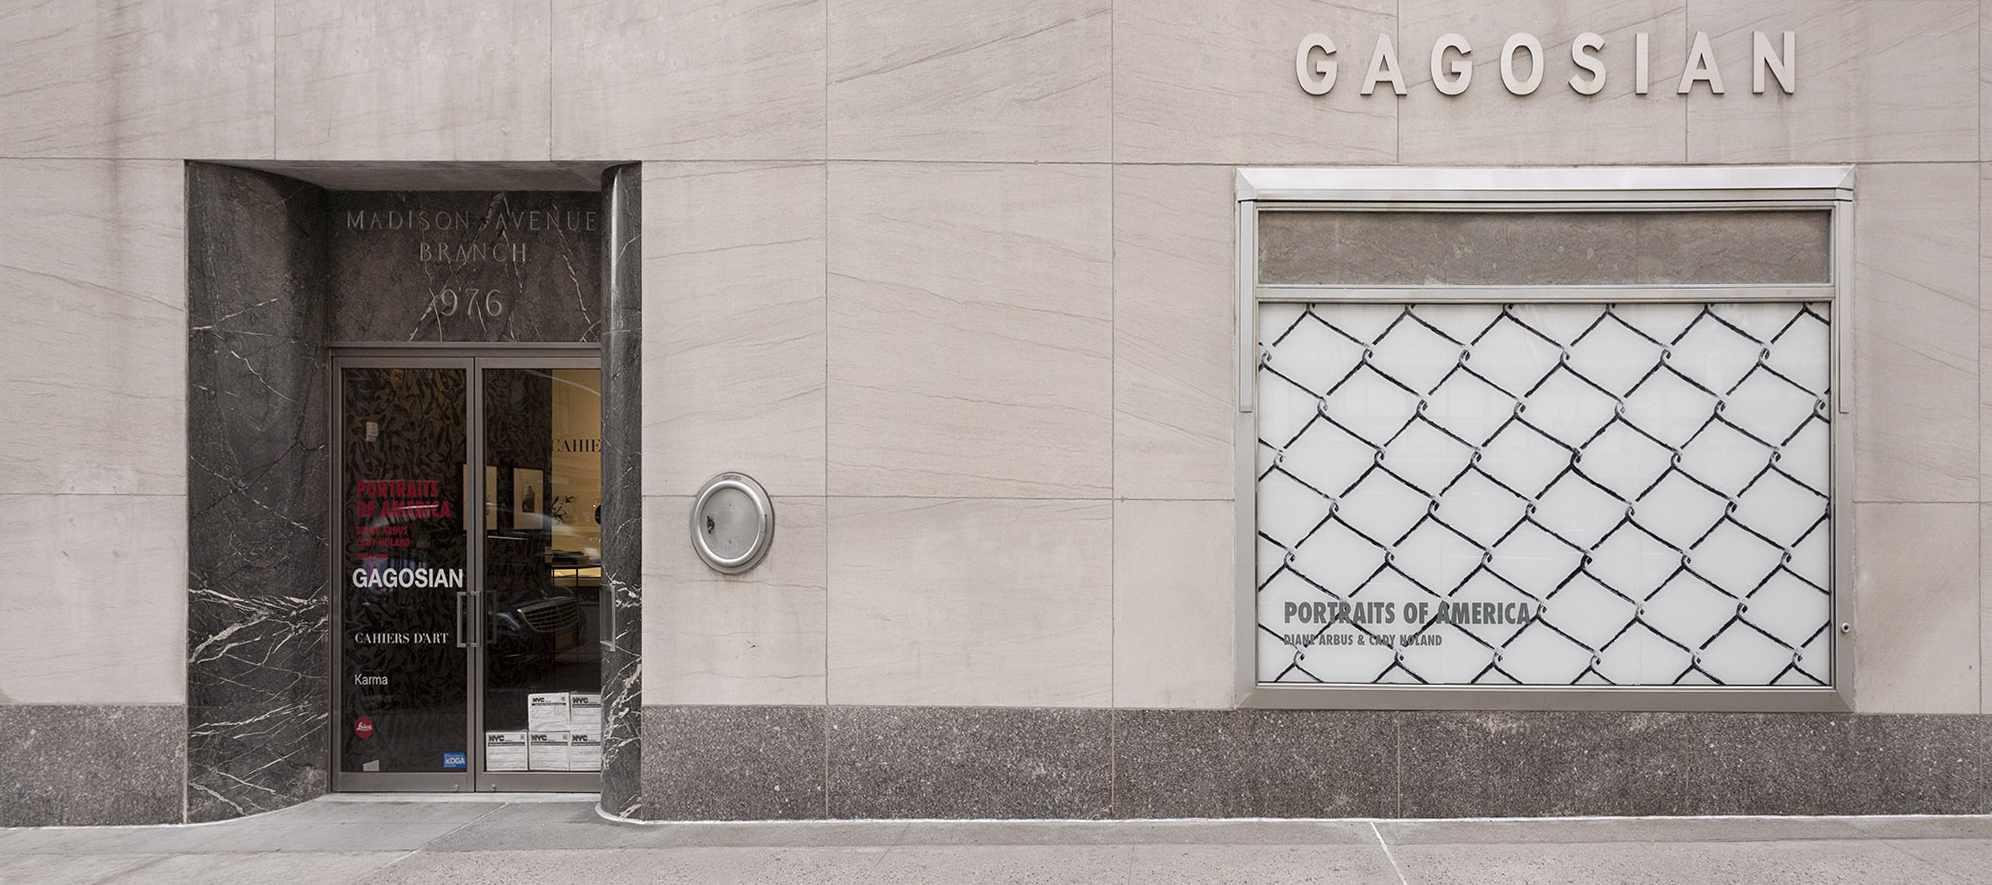 1.-Gagosian-Gallery-976-Madison-c-Gagosian-Gallery.-Photography-by-Robert-McKeever-.jpg